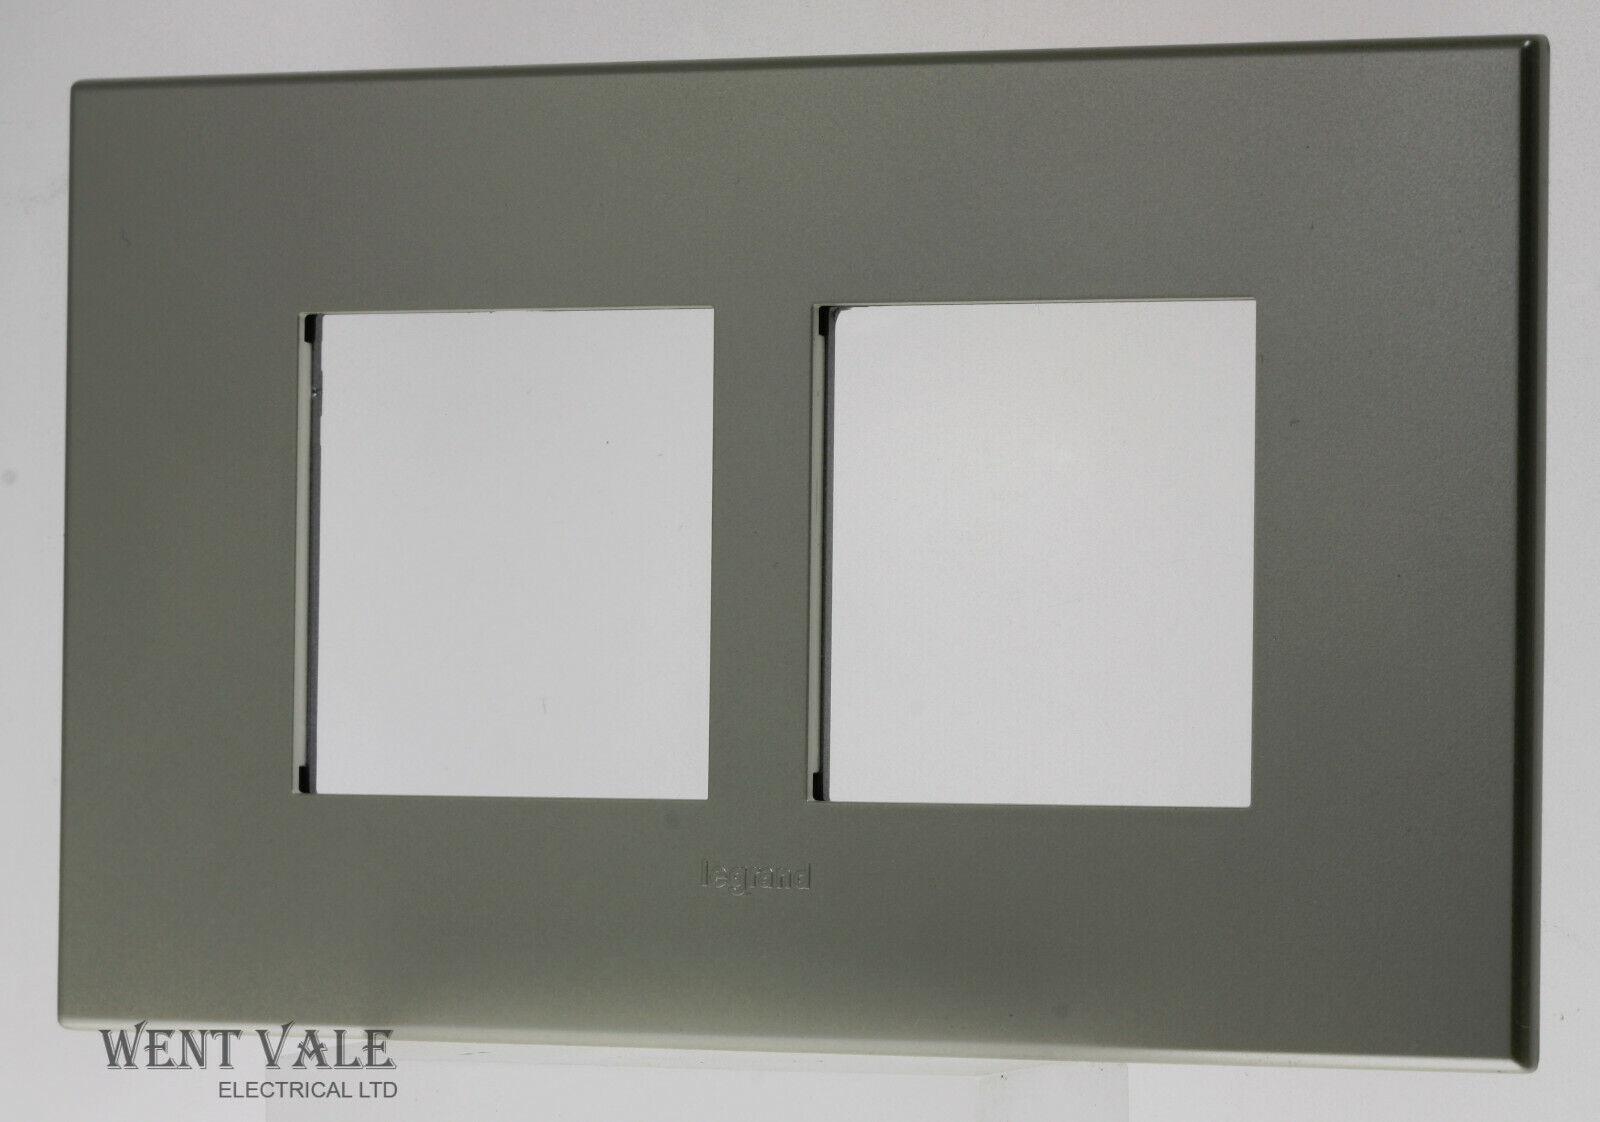 Legrand Arteor Neutral Range 5713 24 - 2g 2 x 2, 4 Modual Champagne Cover Plate